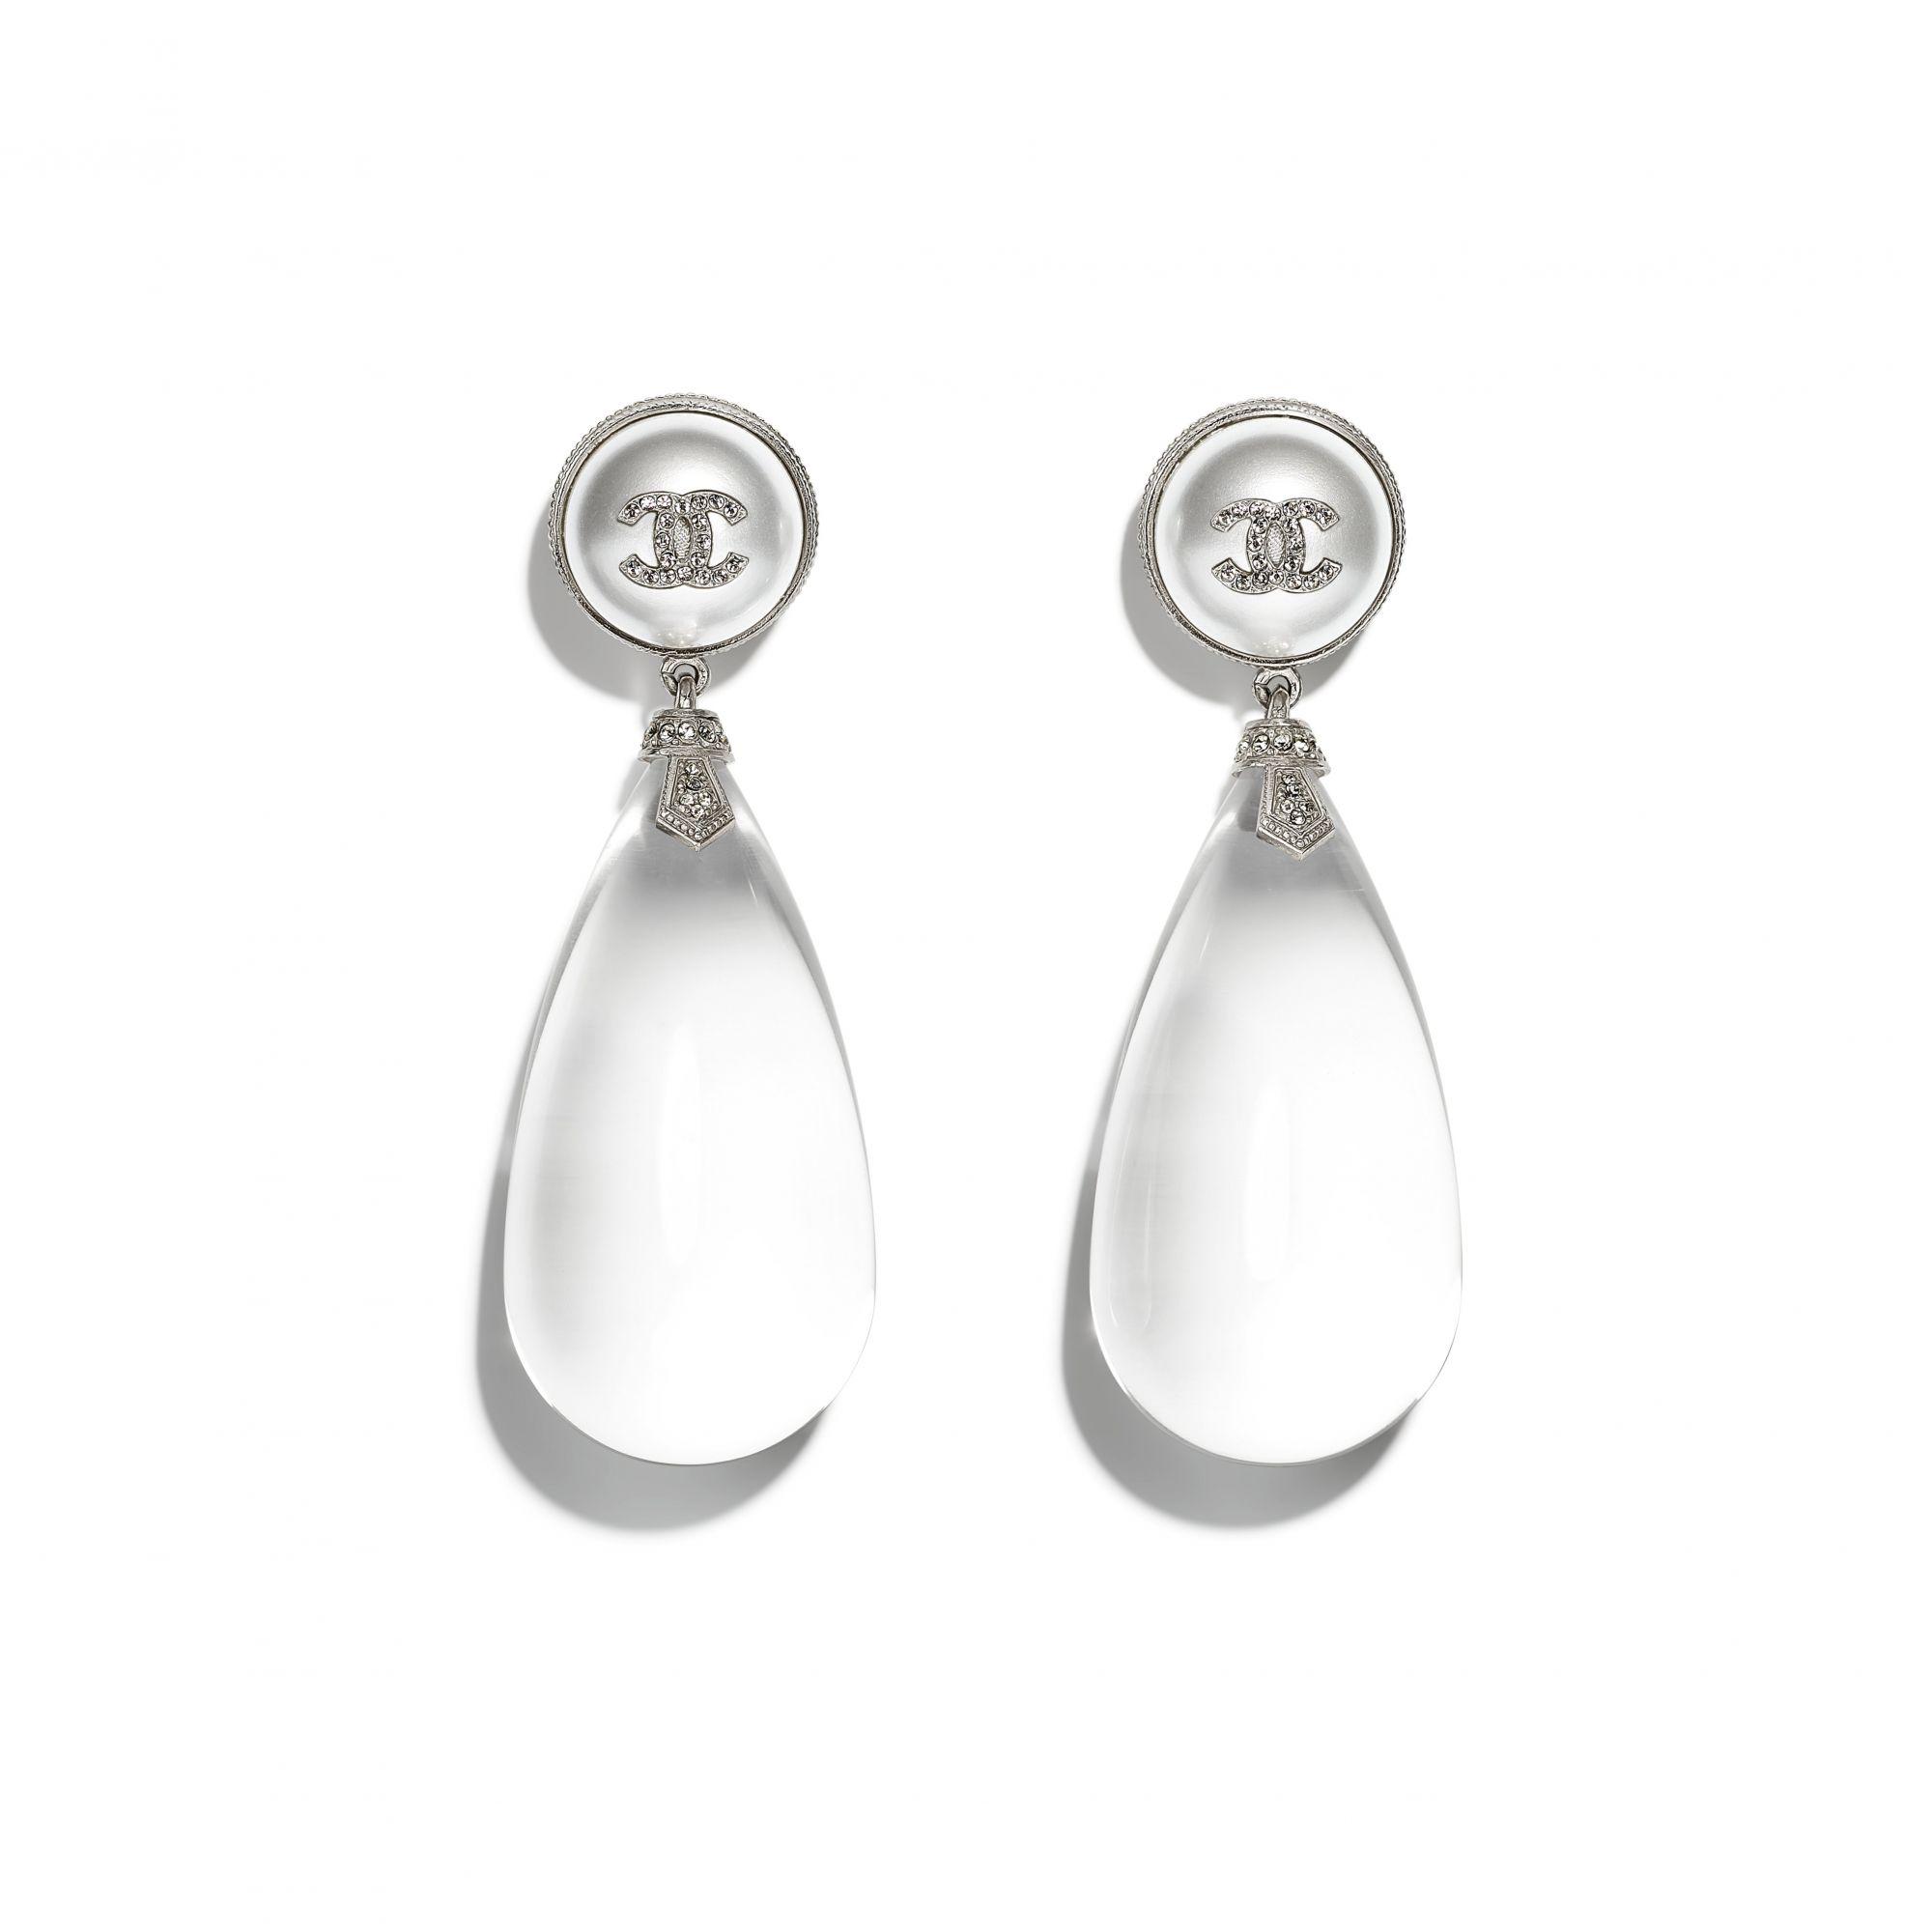 Earrings in resin, metal and strass